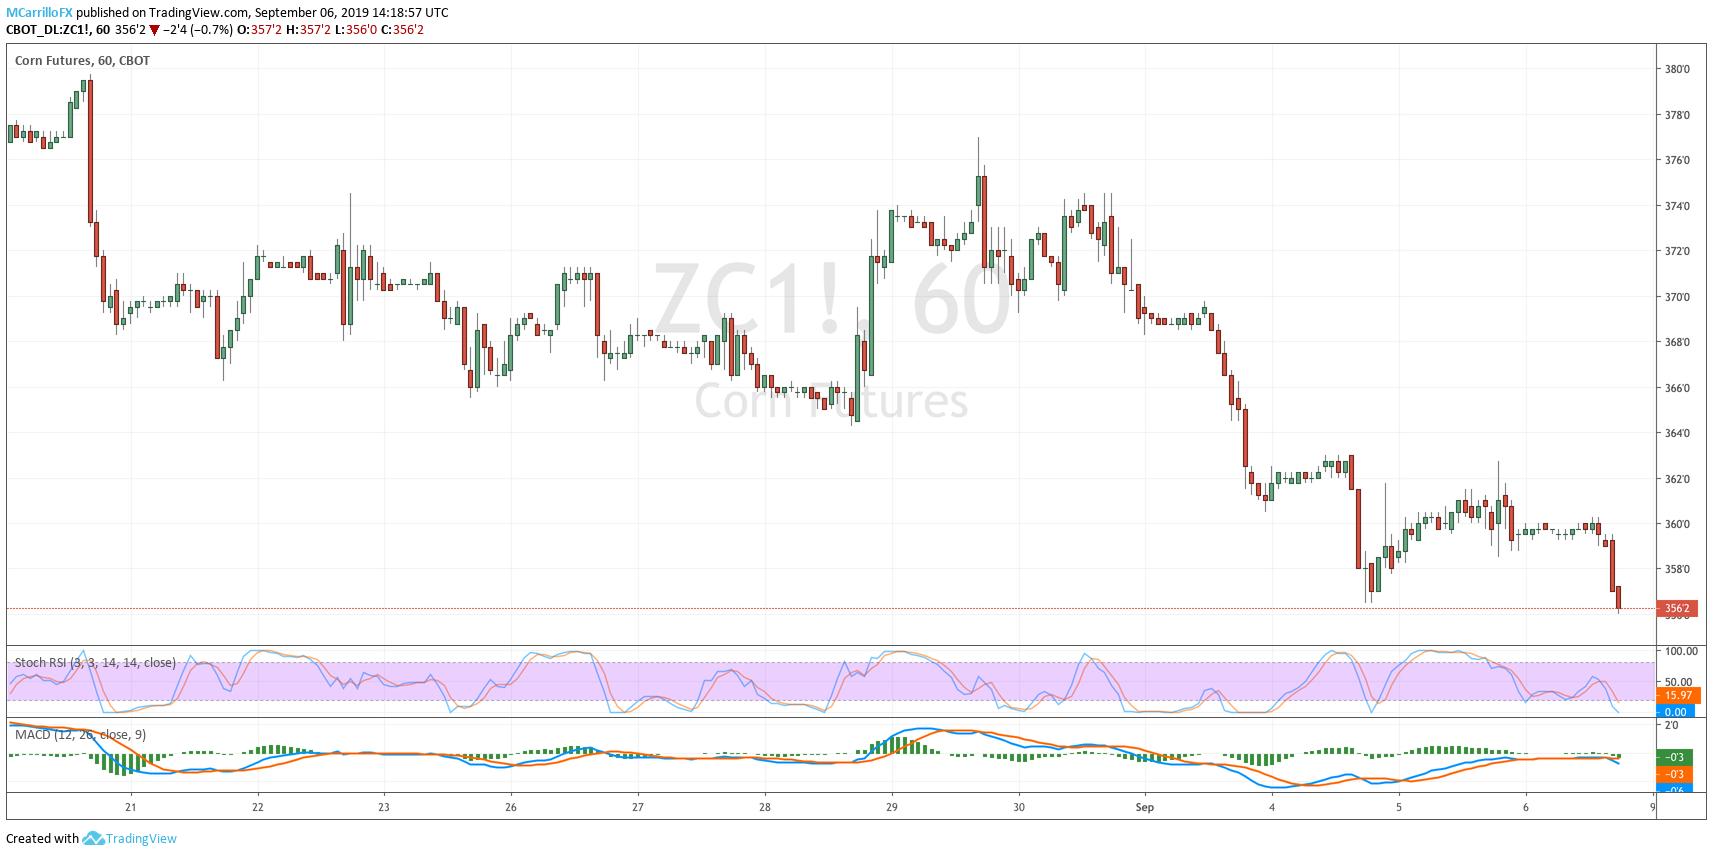 ZC1 Corn Futures 1-hour chart Sept 6